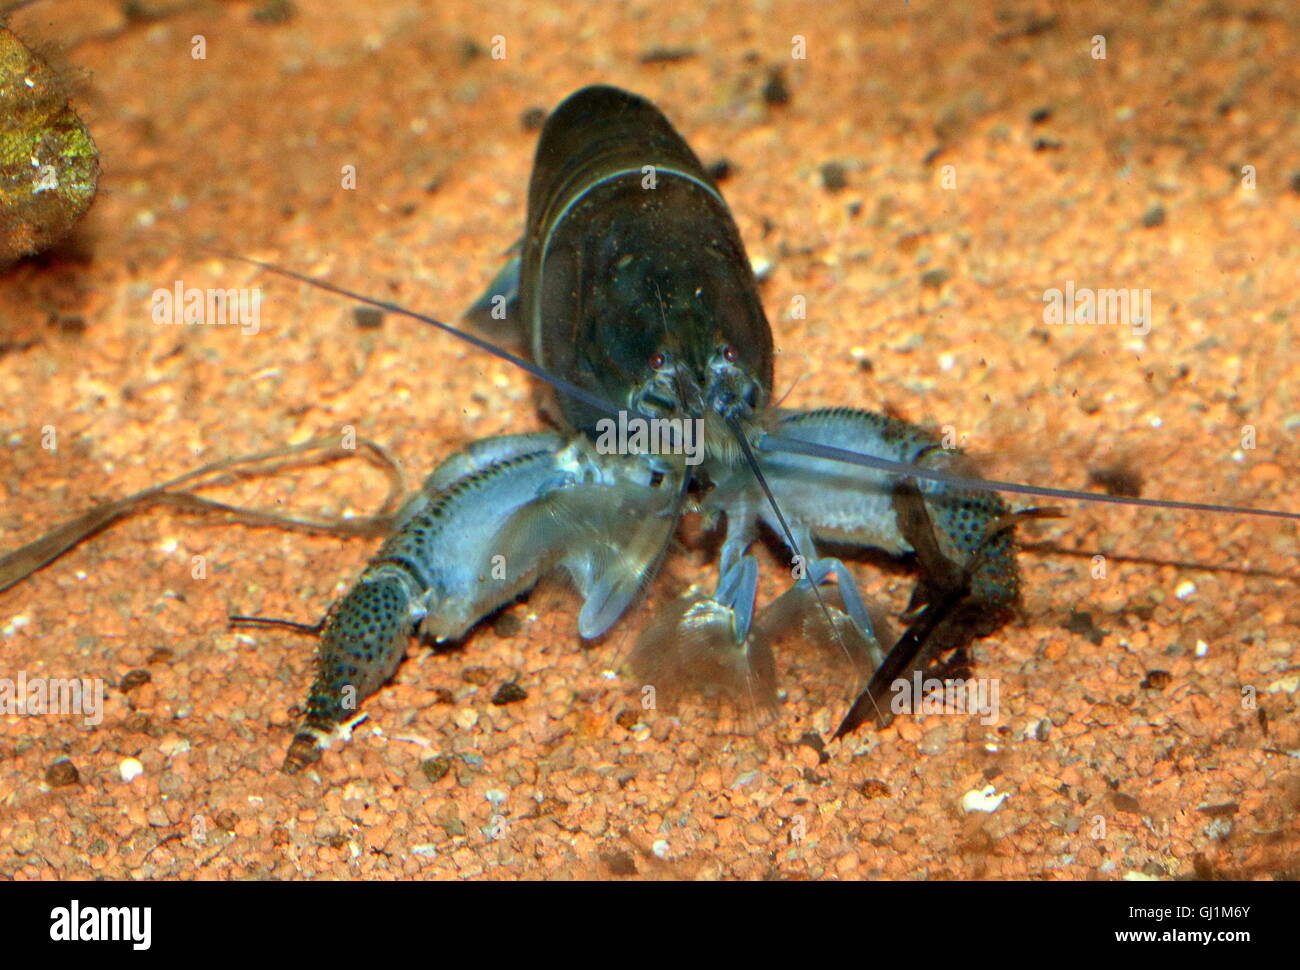 Giant Shrimps Stock Photos & Giant Shrimps Stock Images ...